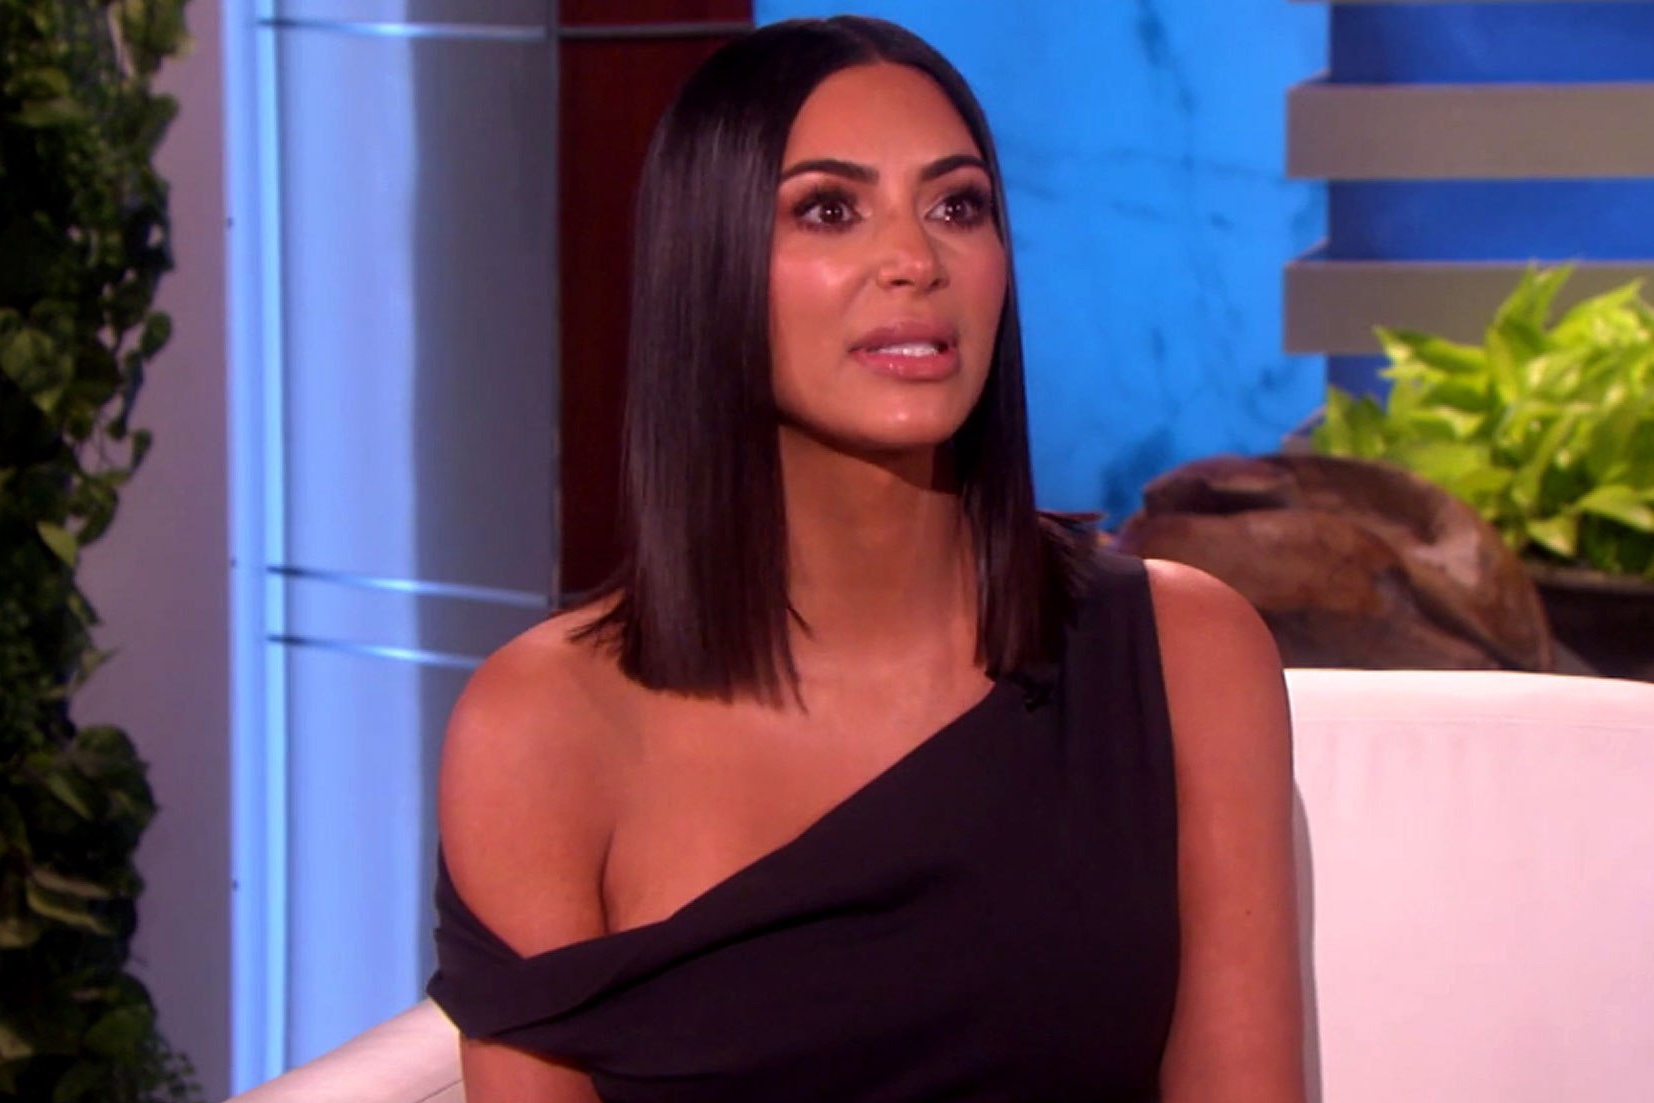 Kim Kardashian on Ellen Degeneres